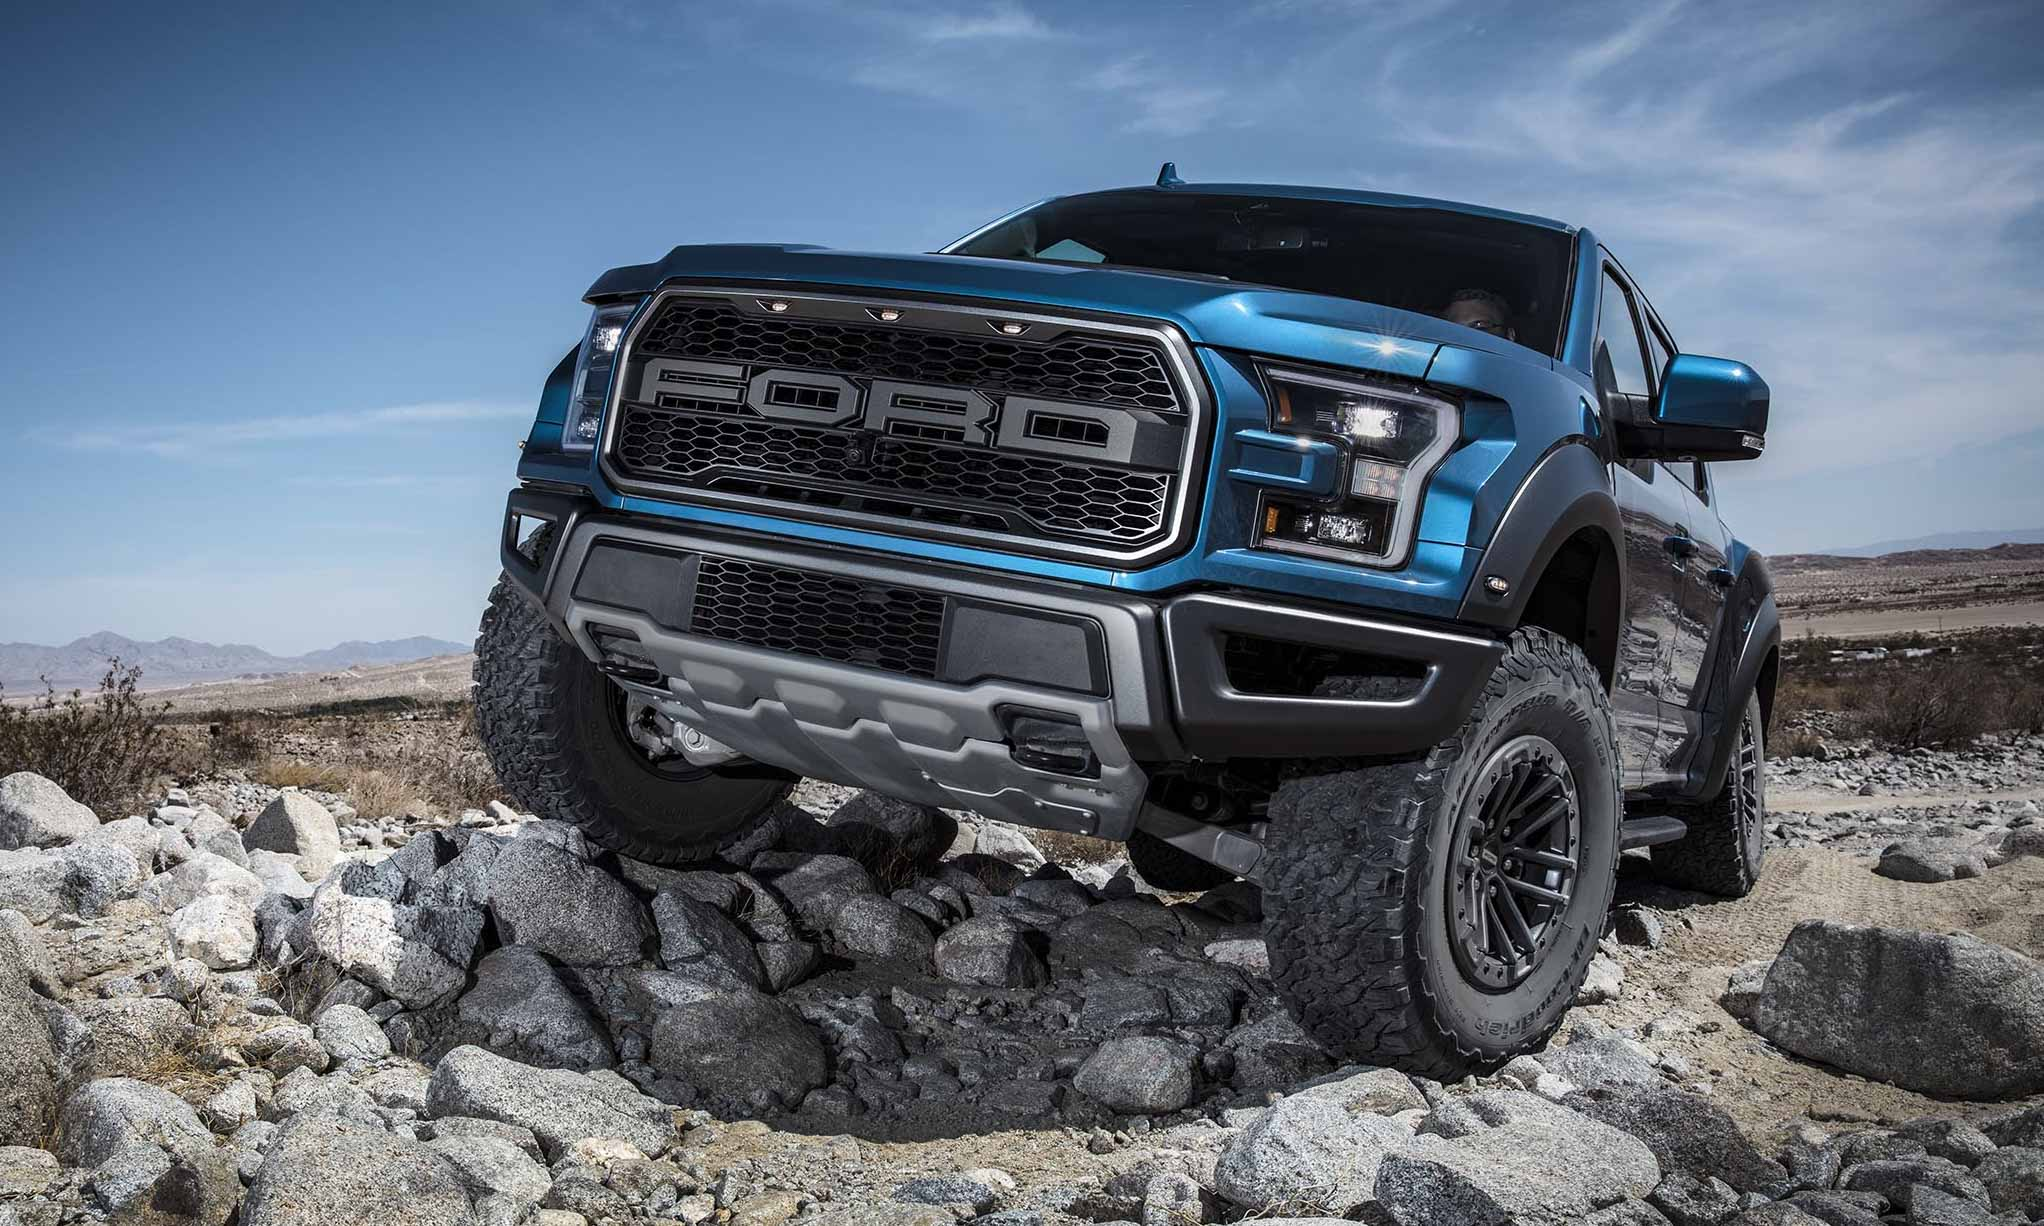 BestSelling Vehicles in America First Half 2019nbsp